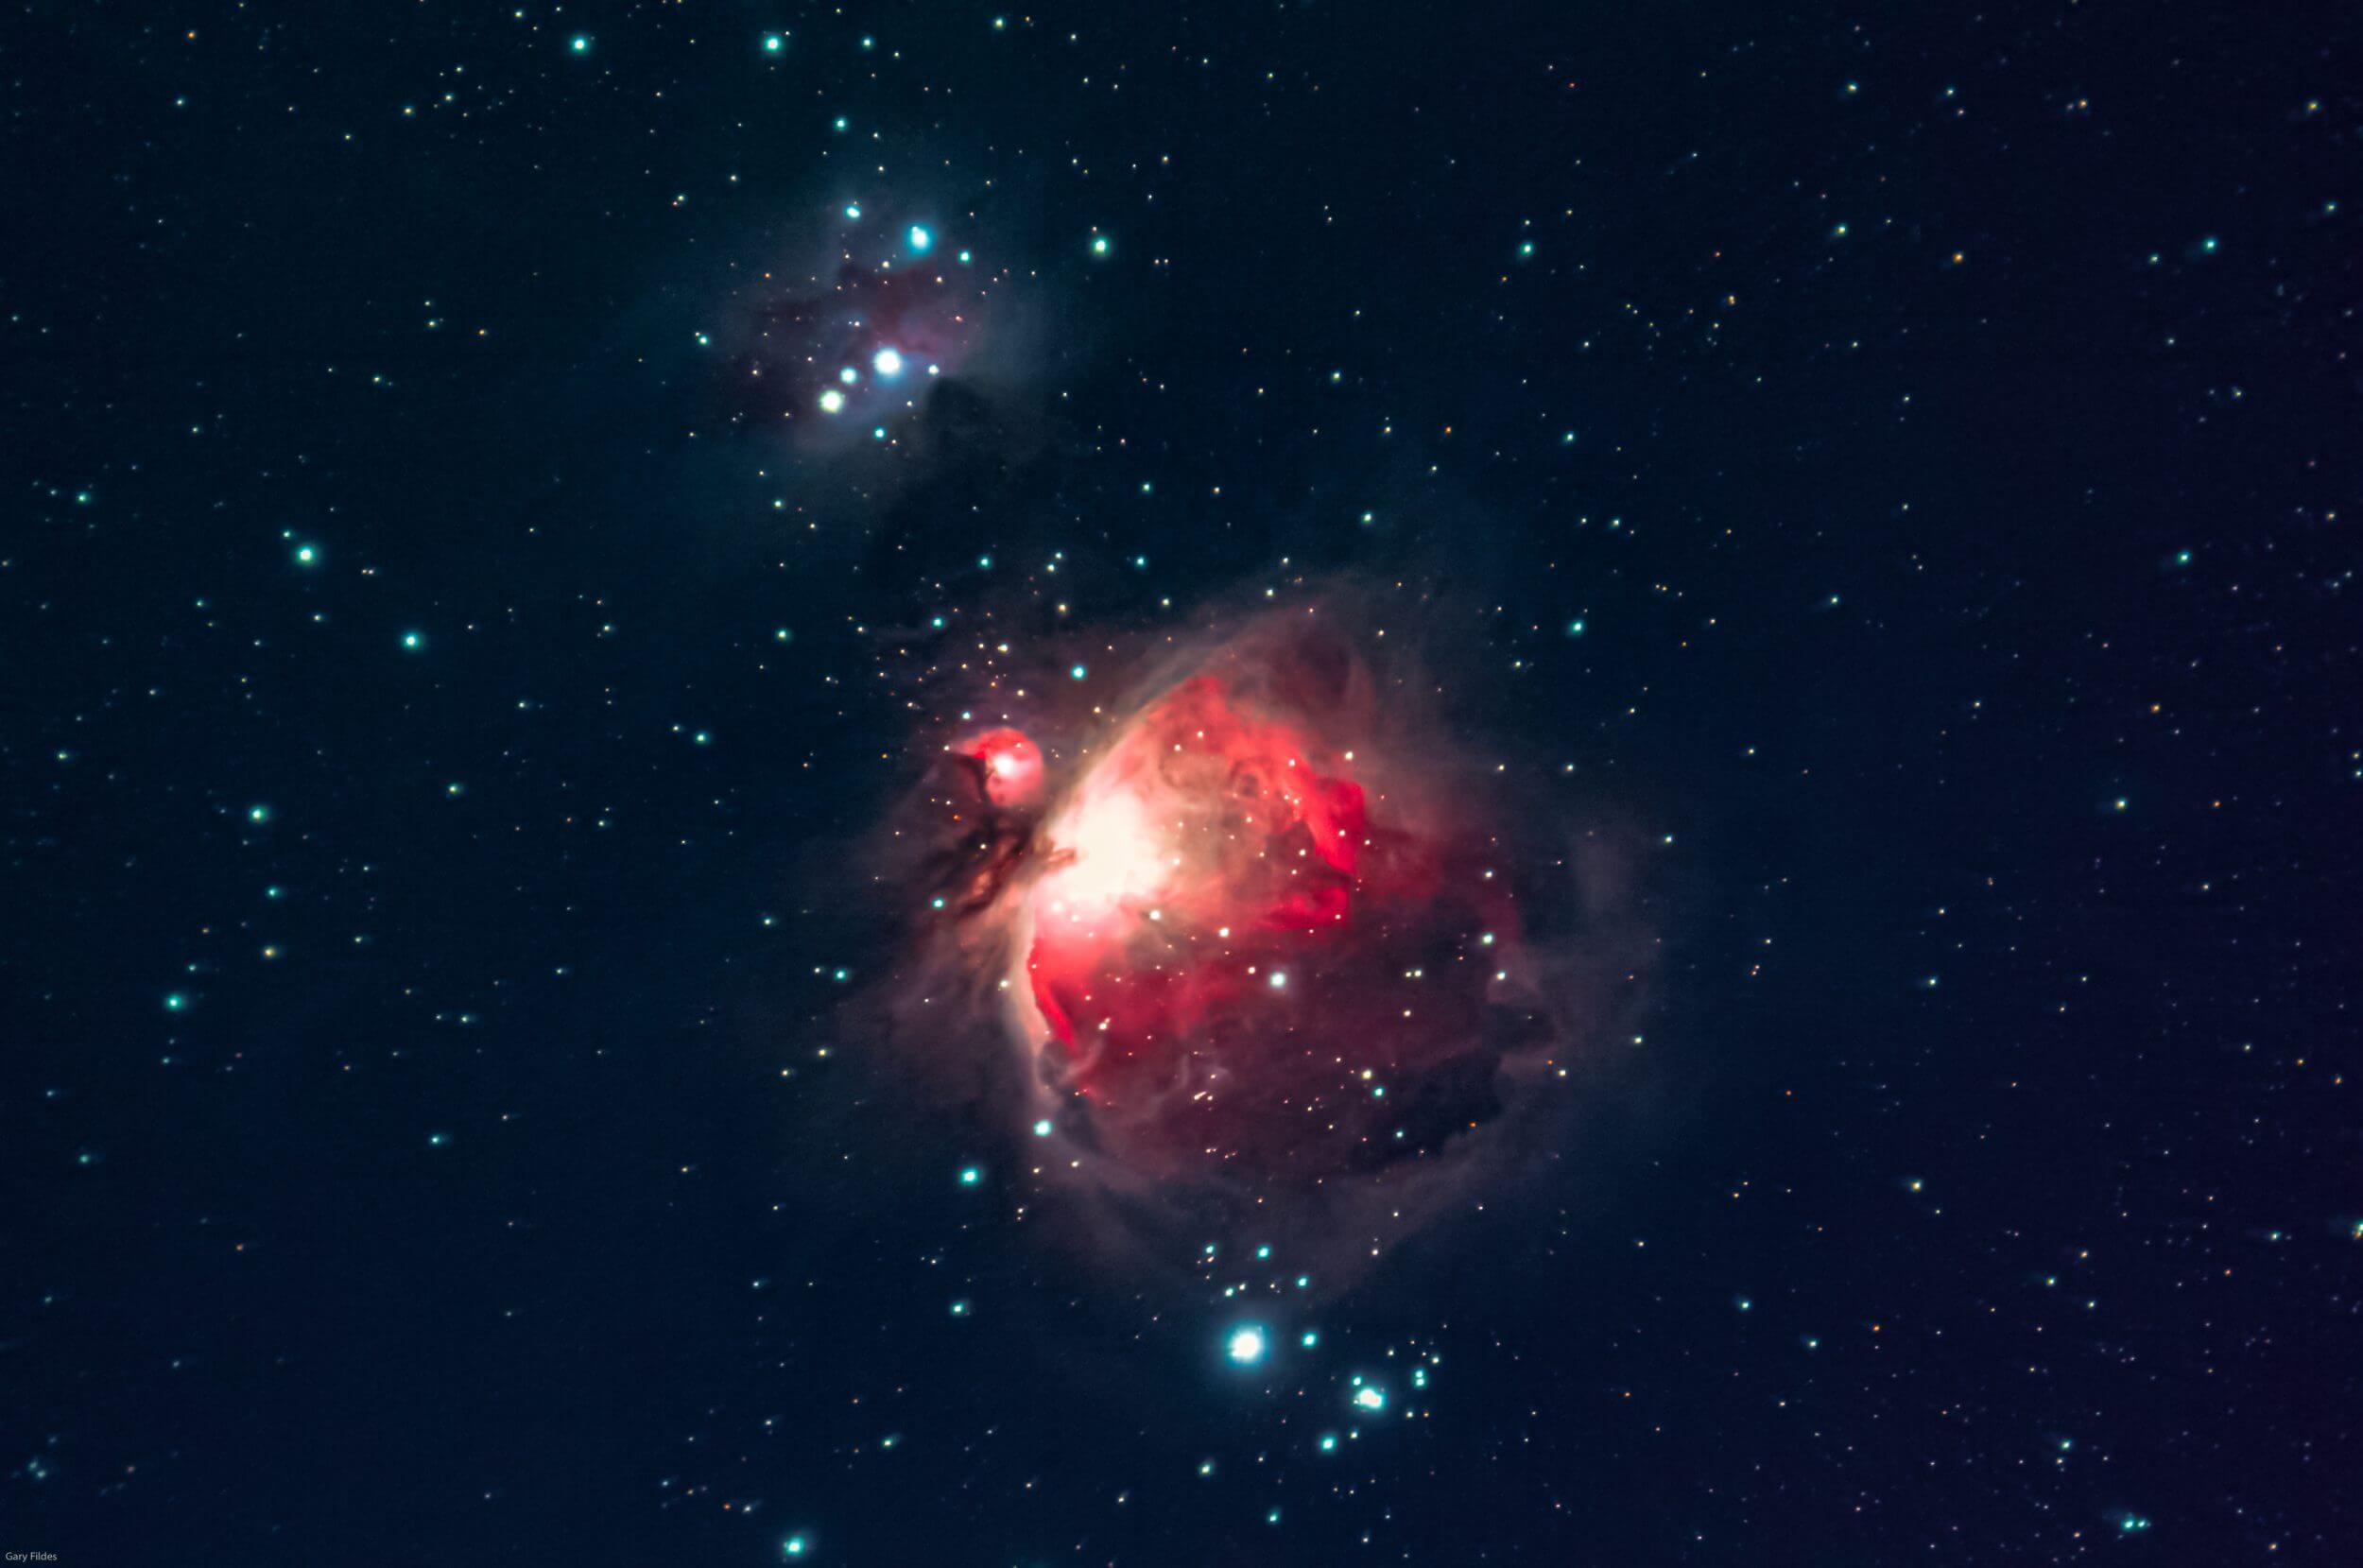 M42 image